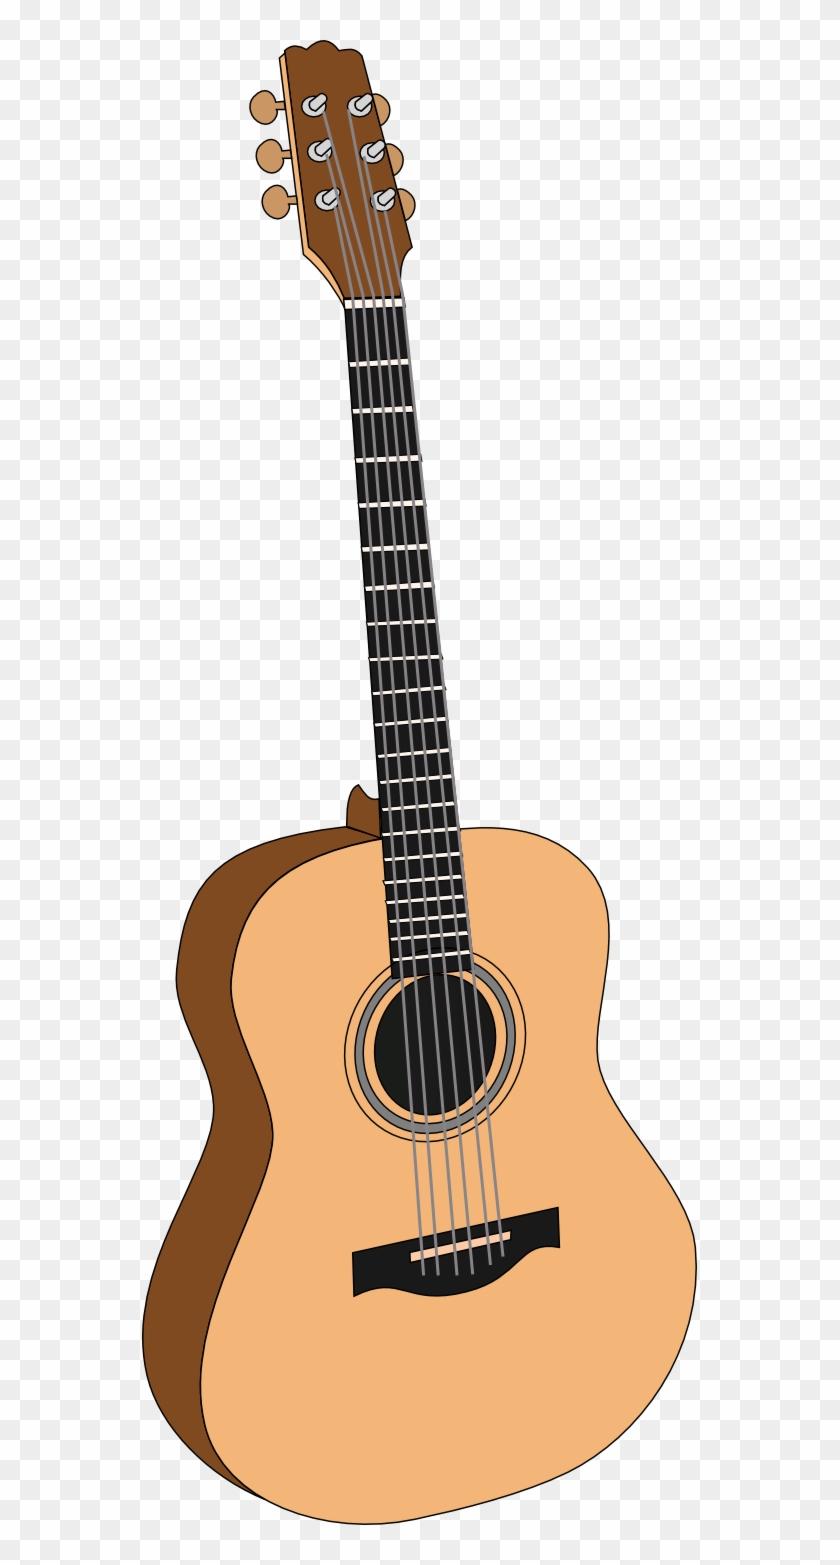 Acoustic Guitar Png - Guitar Clip Art Transparent, Png Download ... clip art transparent